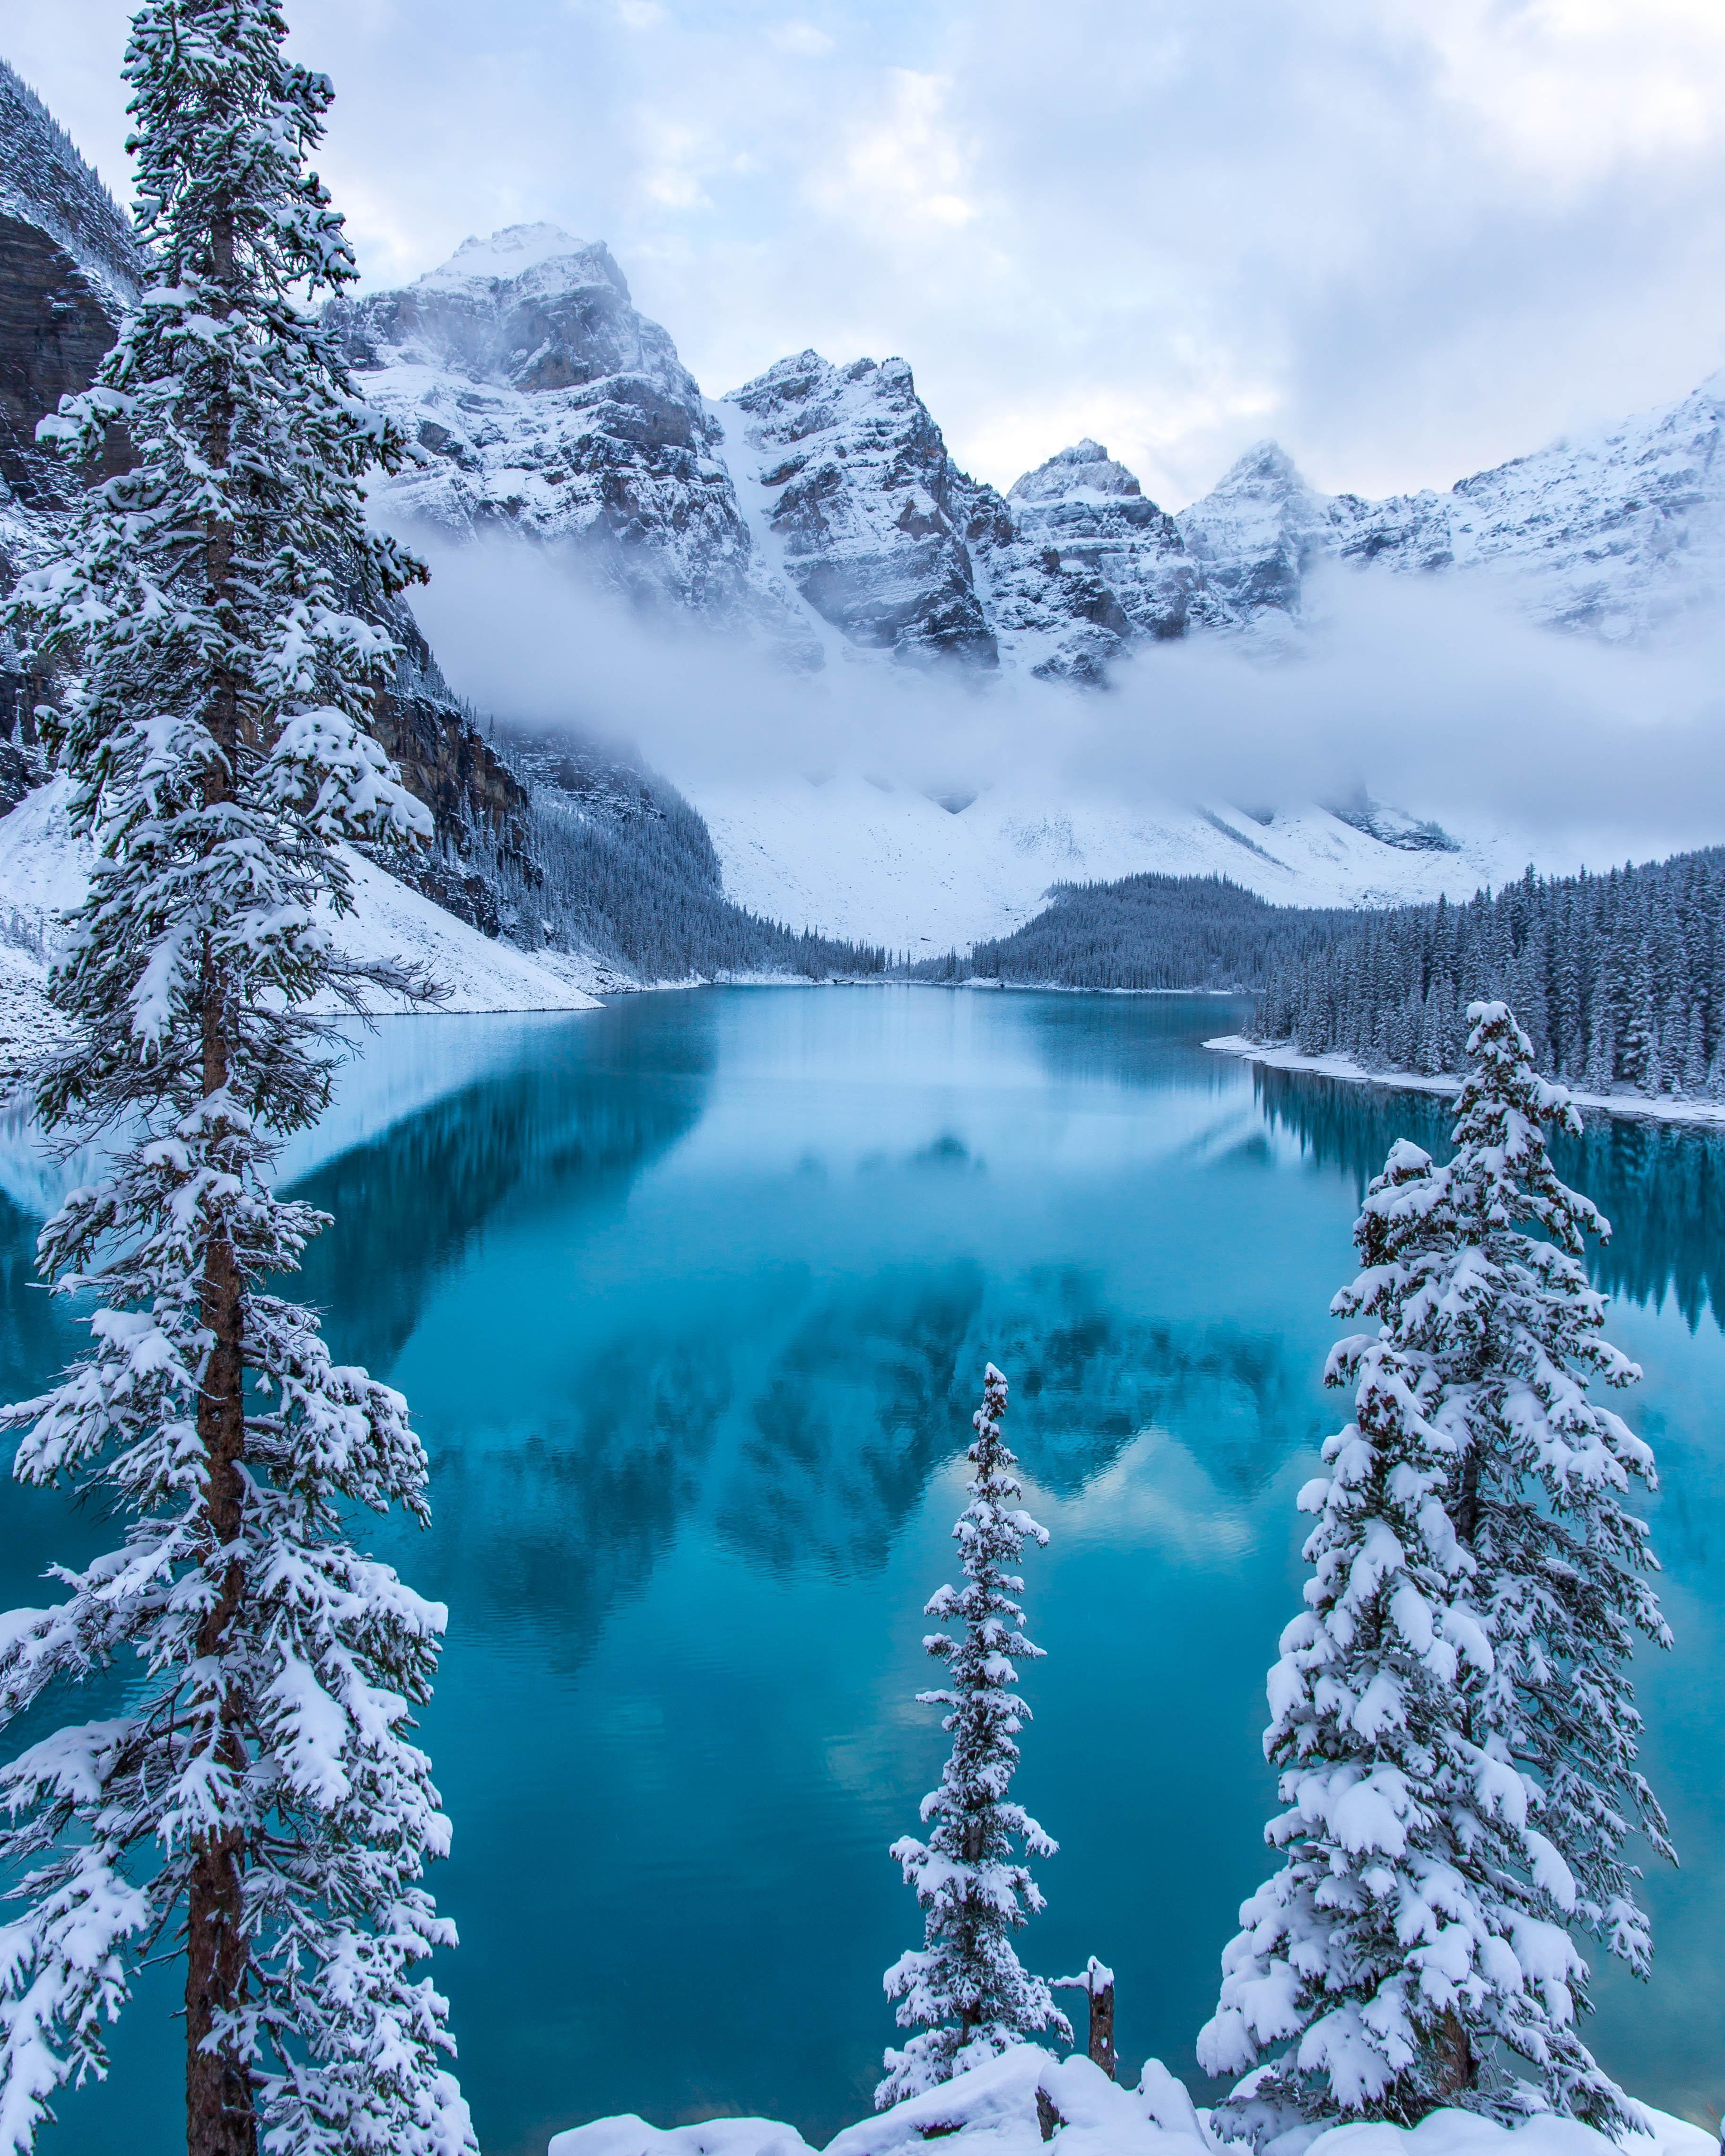 Pin By Erna Jaksic On Nature In 2020 Winter Landscape